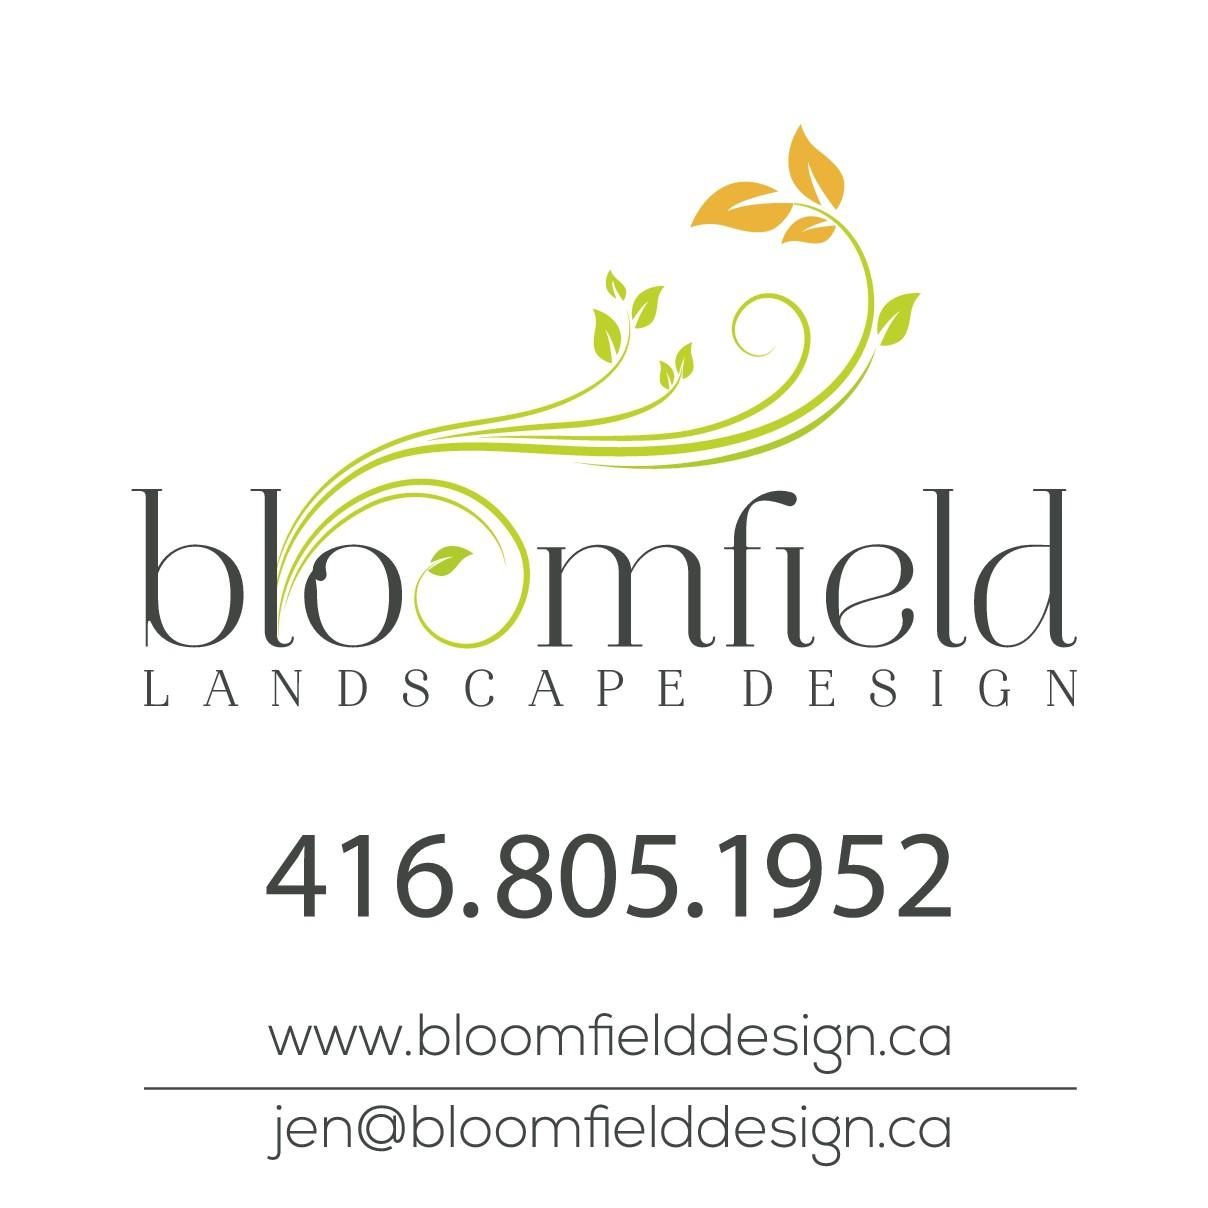 Bloomfield Landscape Design